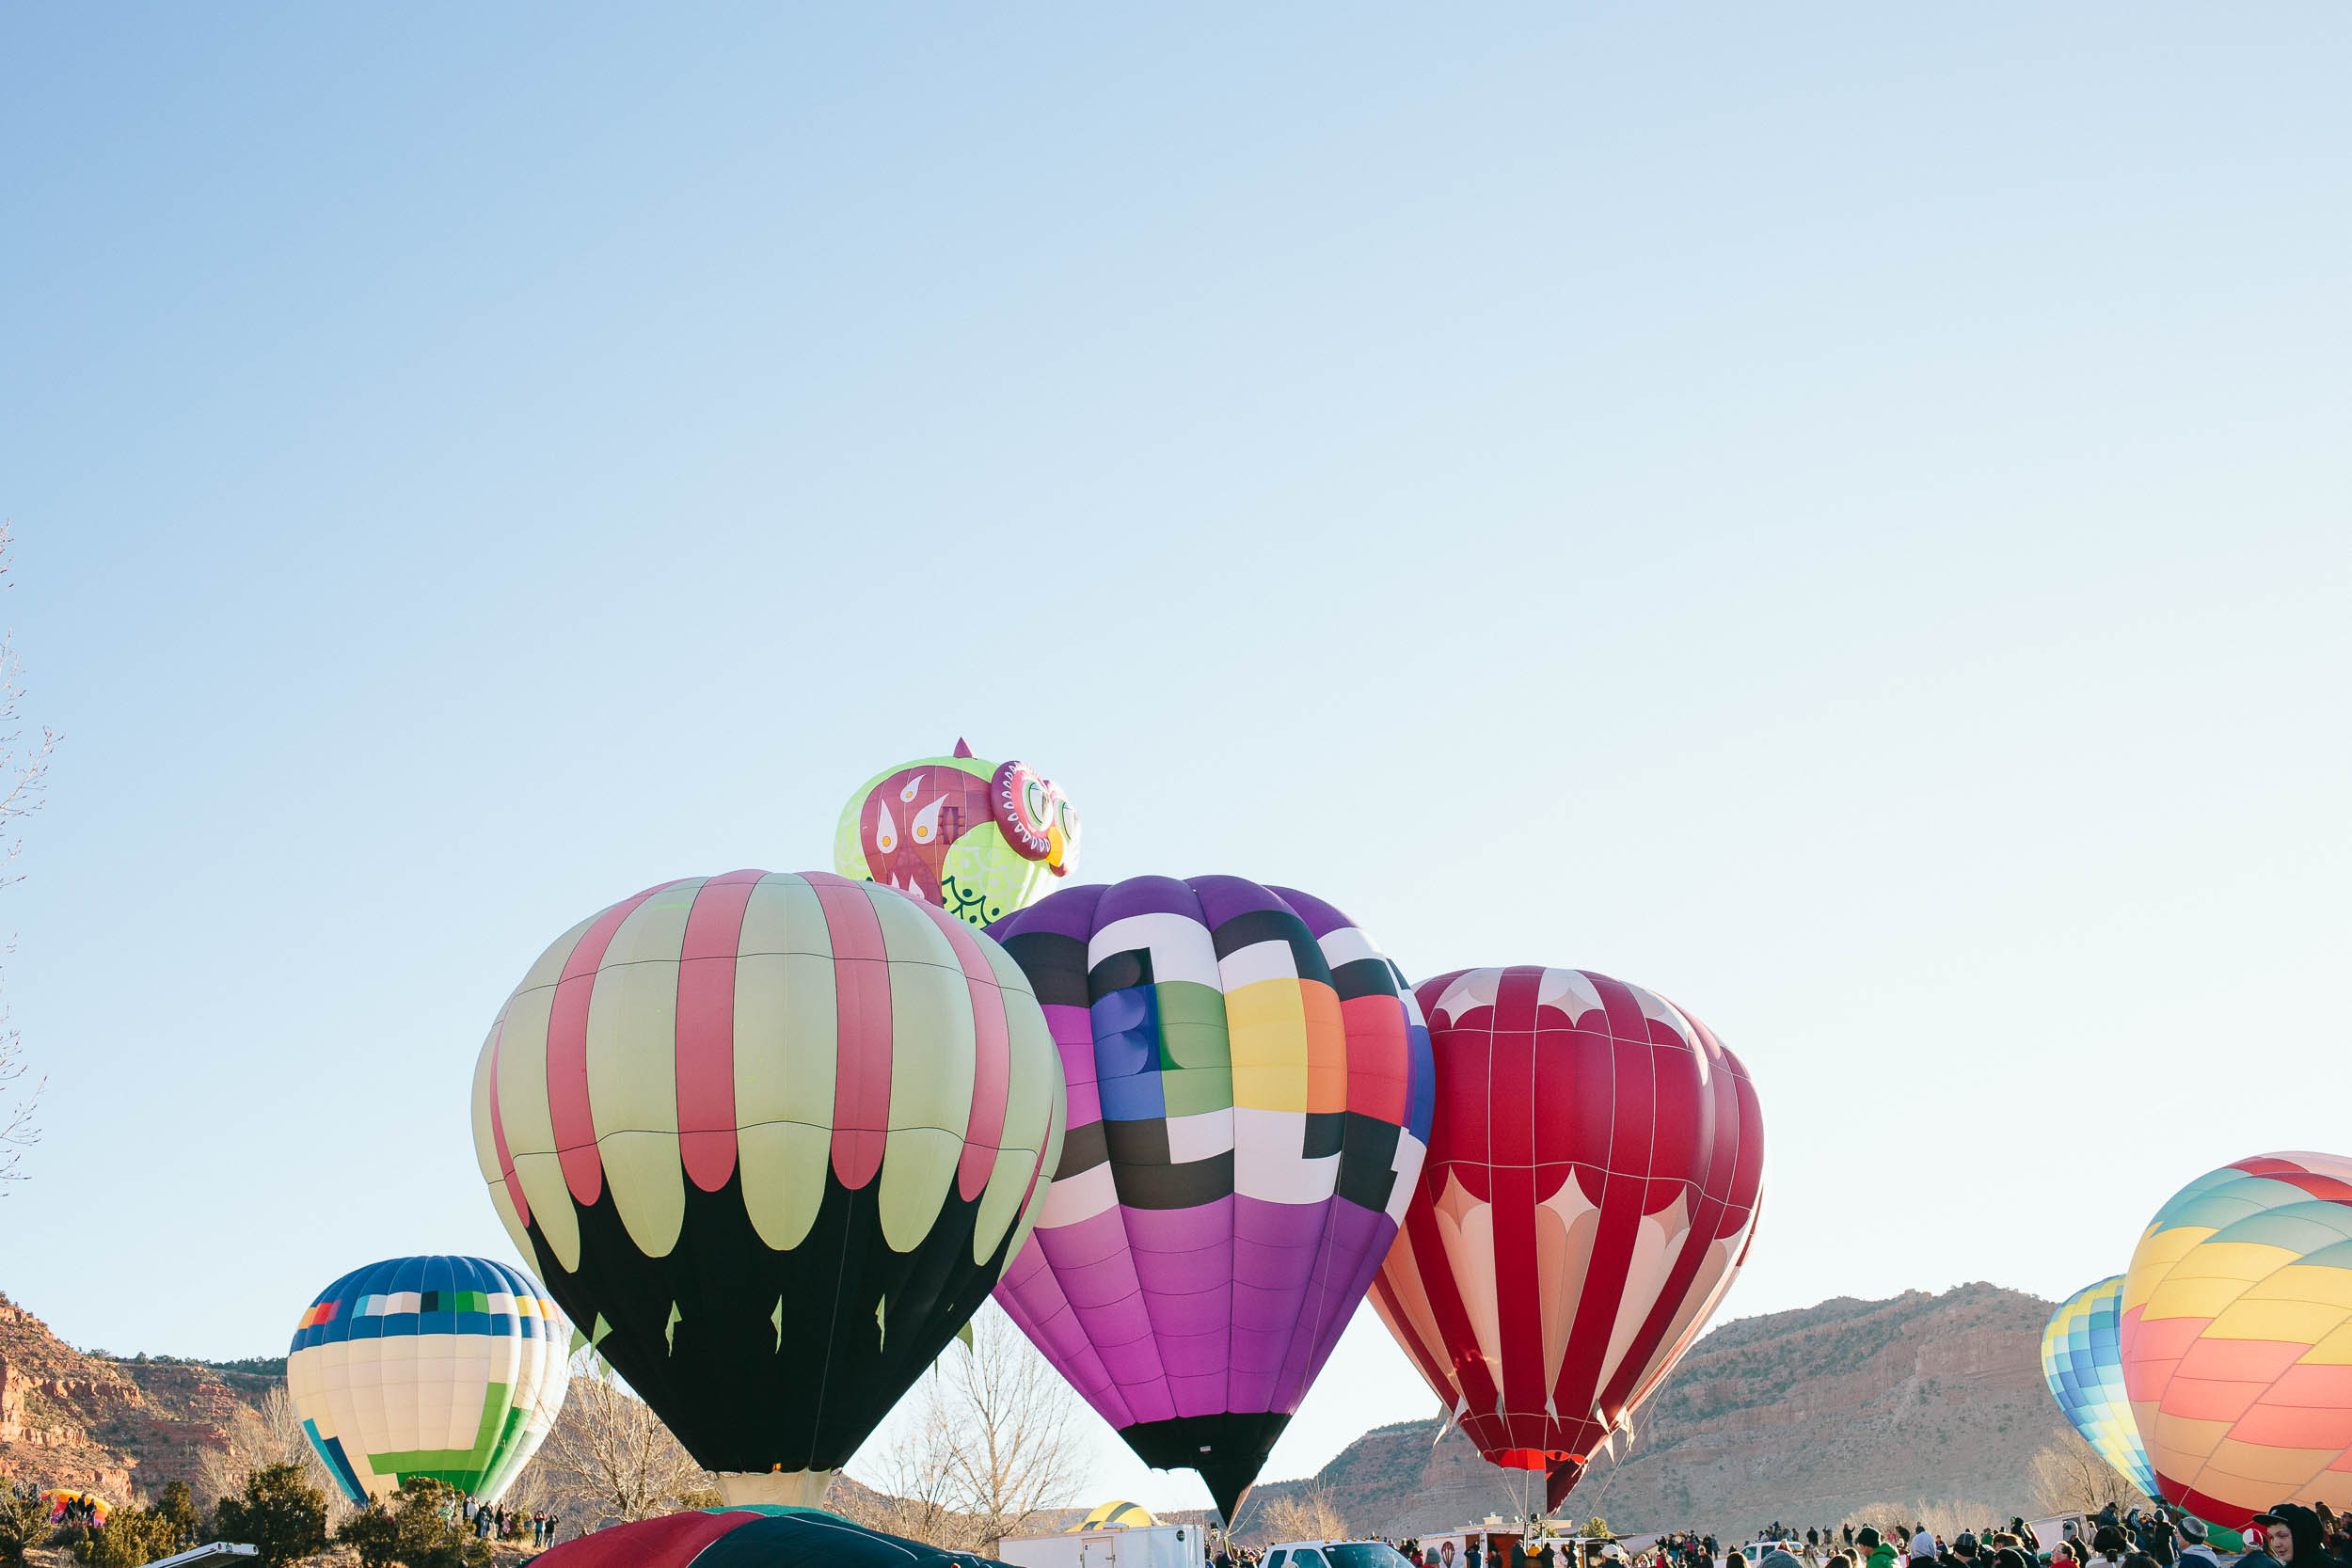 Kyle-Sheppard-Kanab-Balloon-Festival-7.jpg